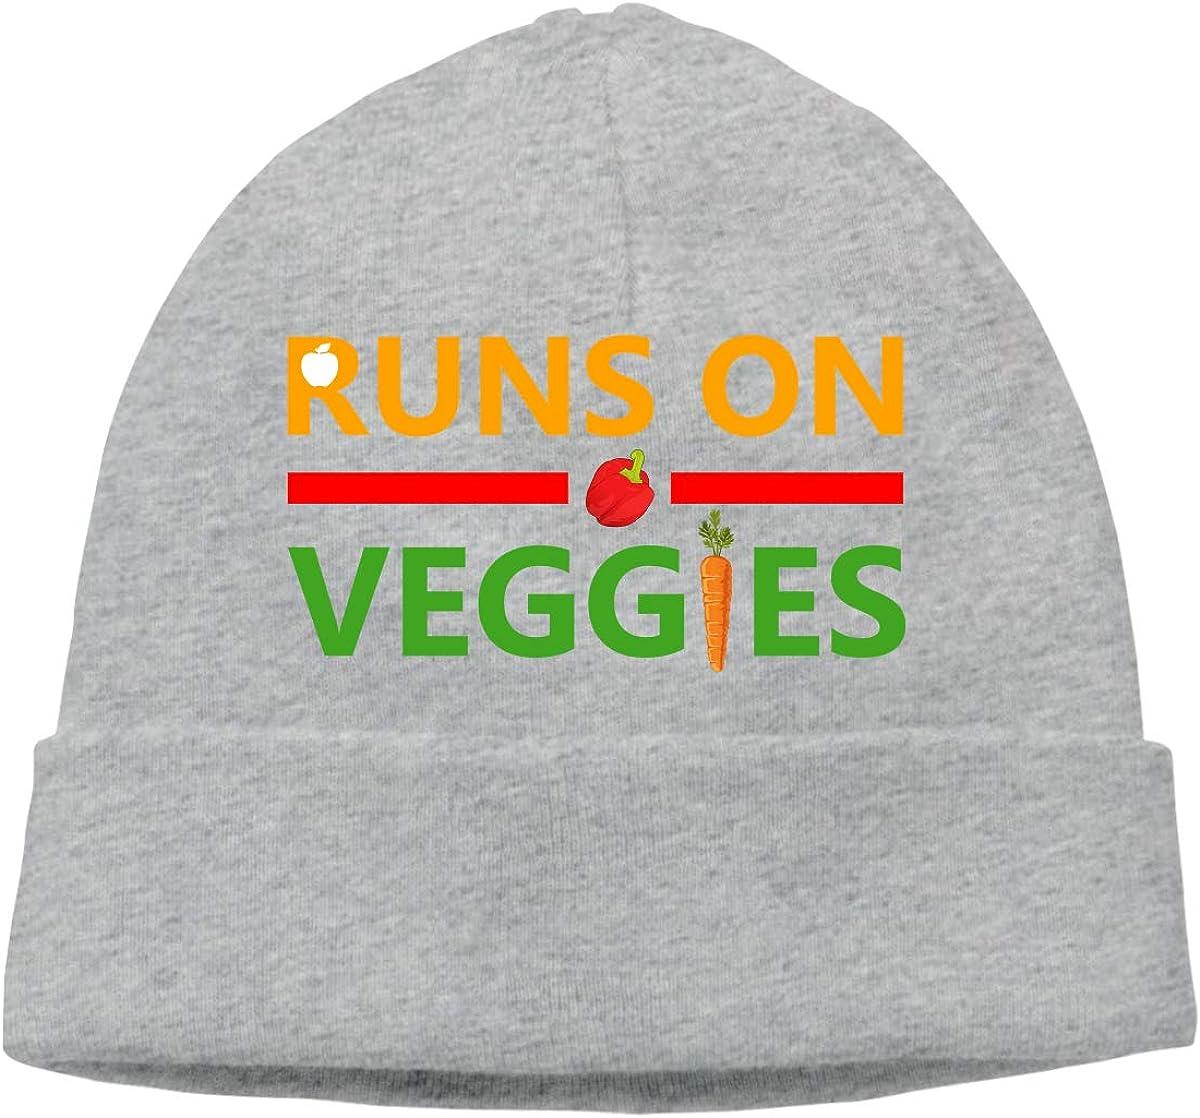 Beanie Hat Runs On Veggies Warm Skull Caps for Men and Women